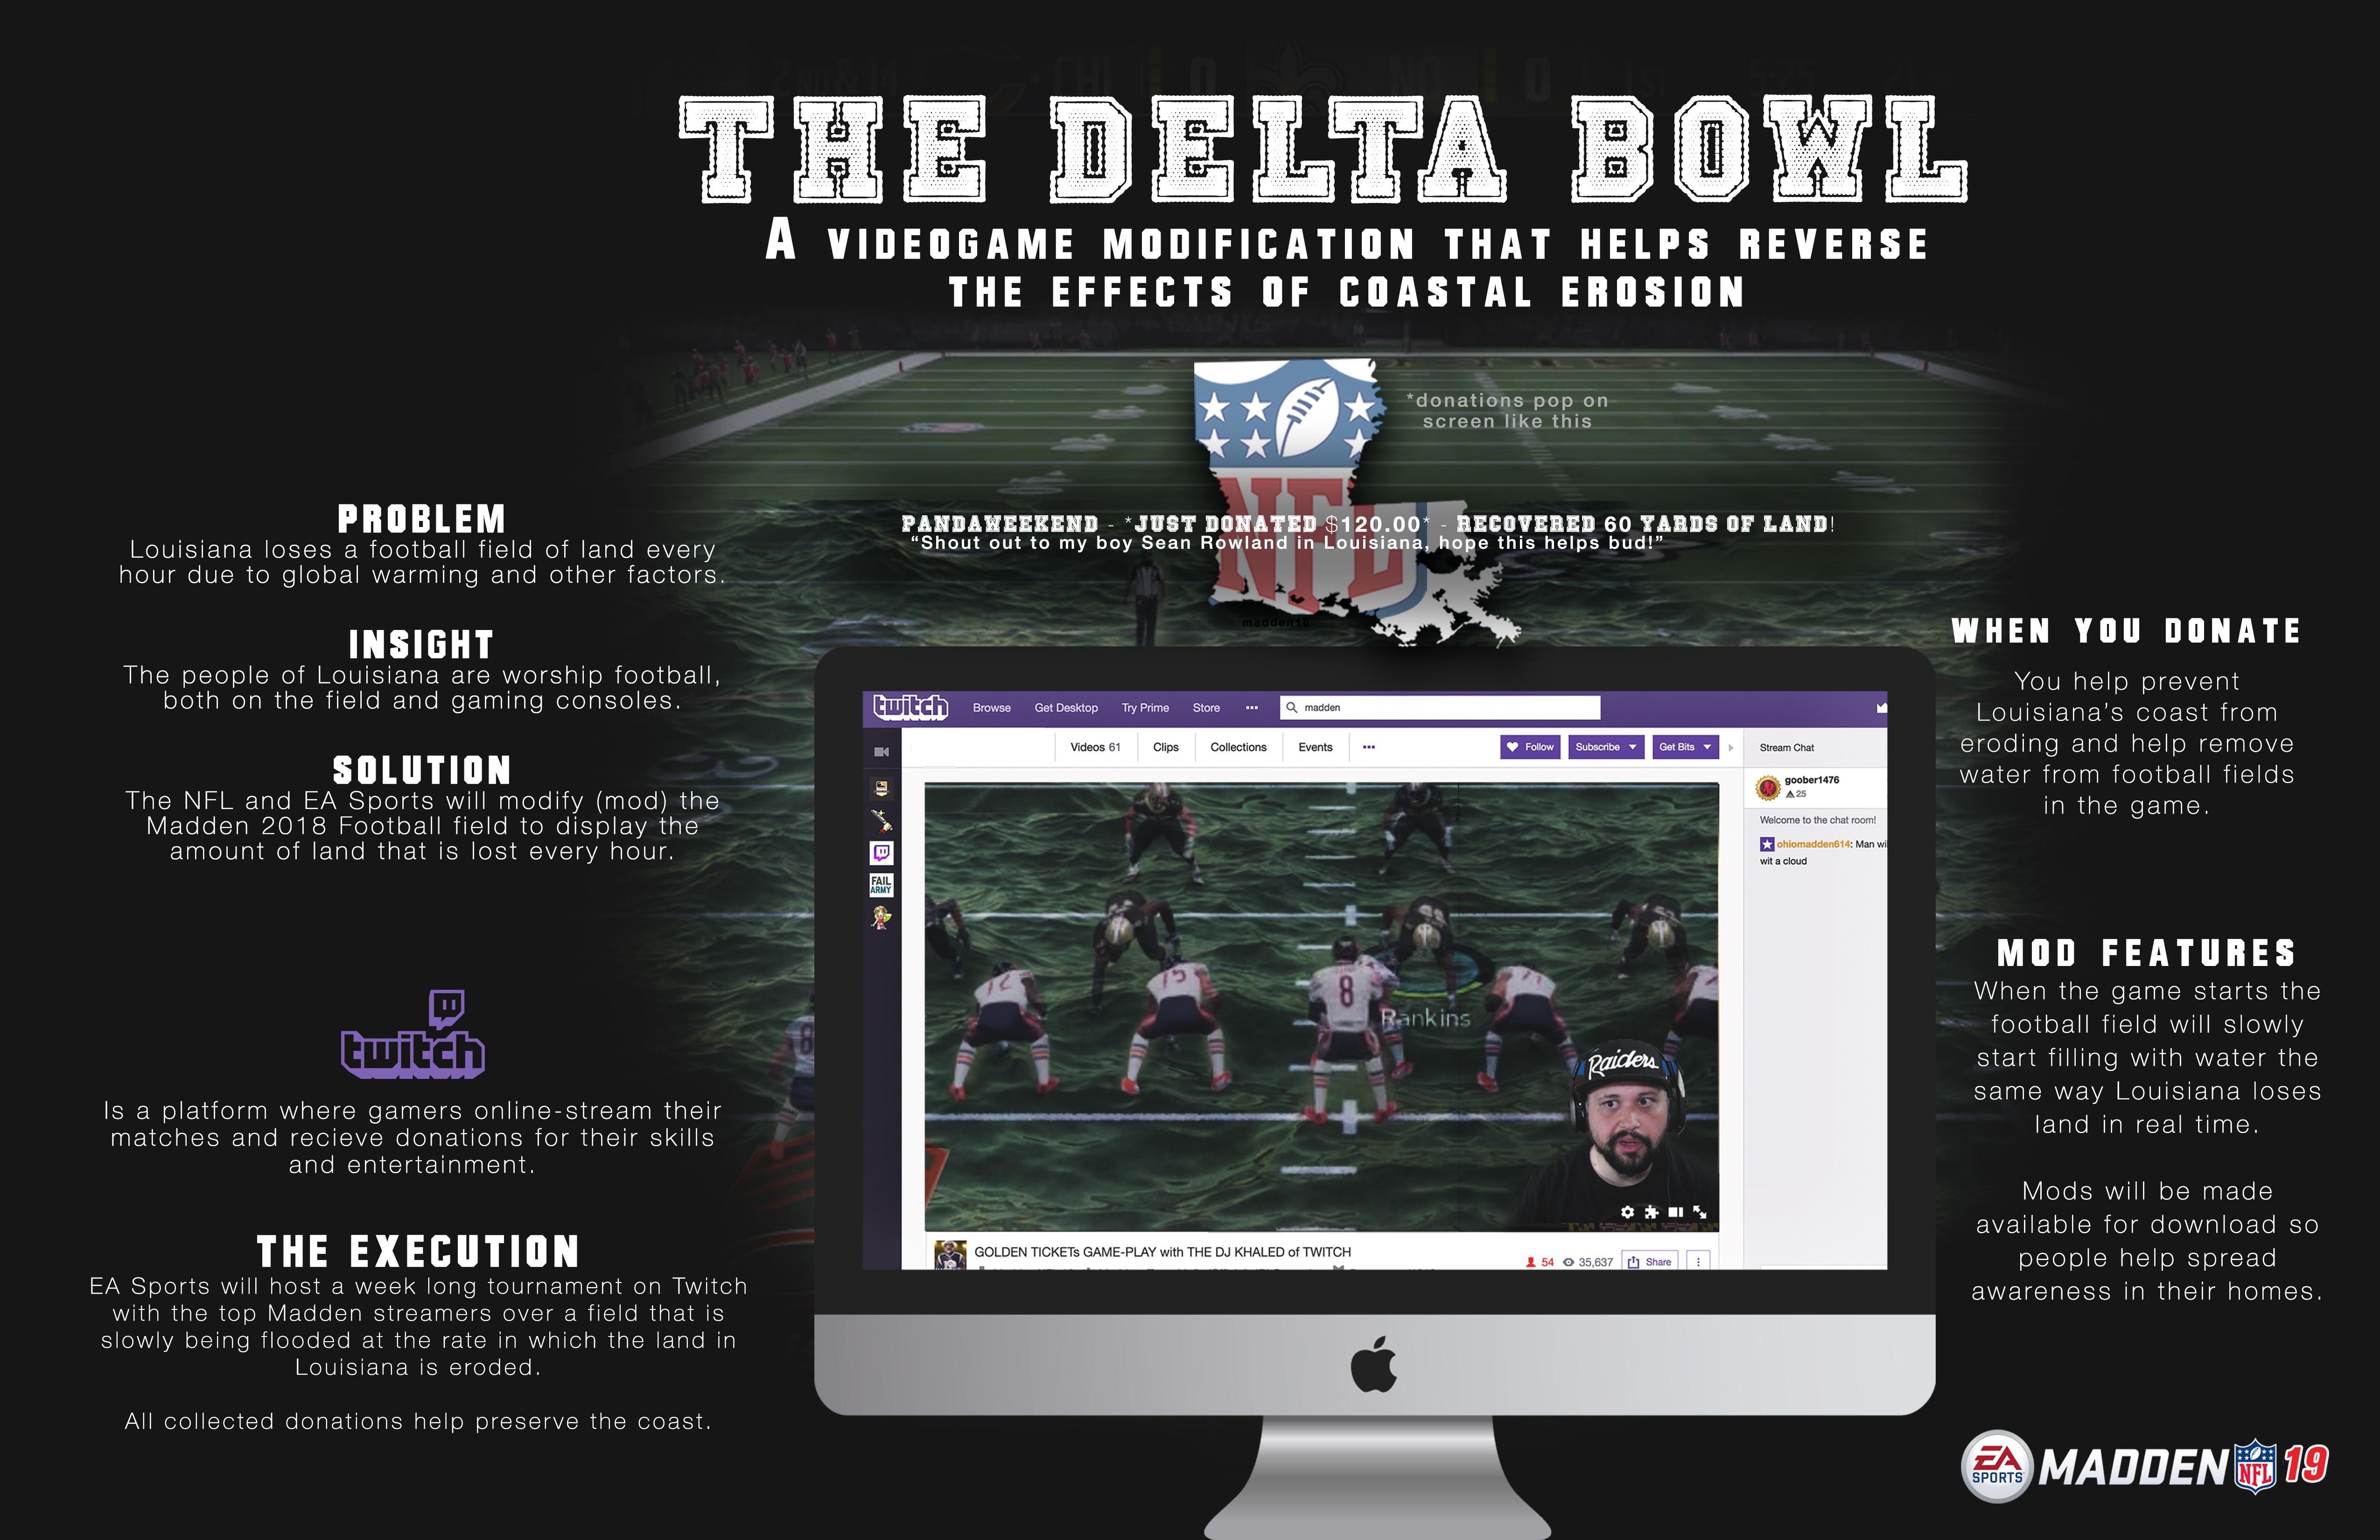 Flipboard: EA SPORTS - MADDEN NFL 19 - THE DELTA BOWL